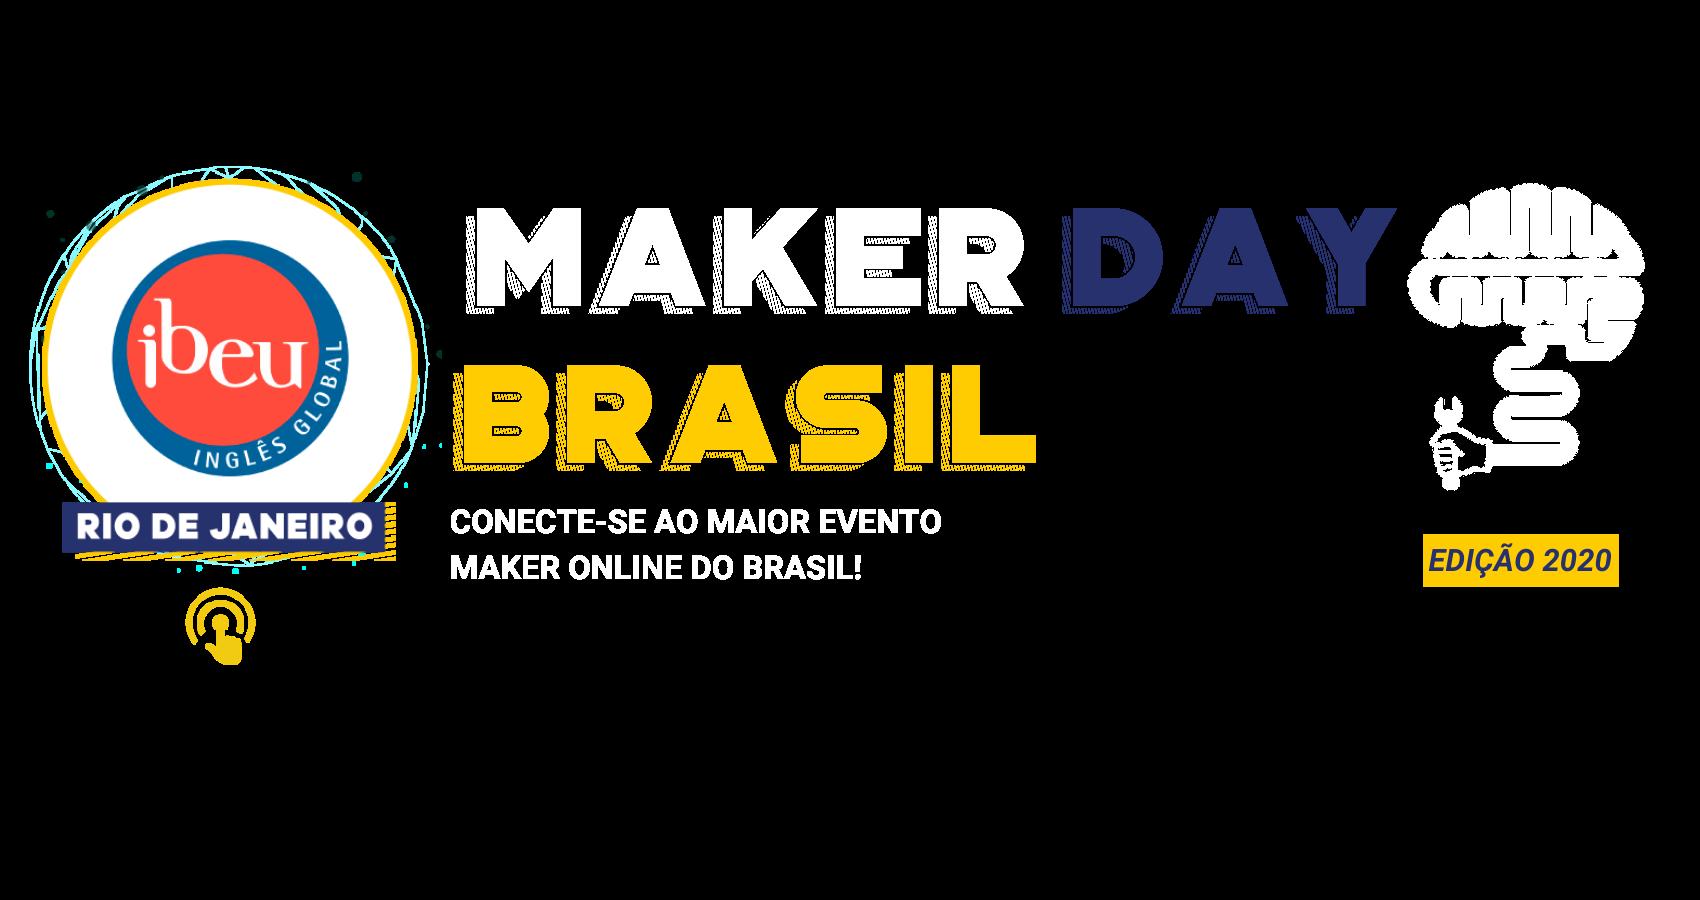 Maker Day Brasil Capa Rio de Janeiro